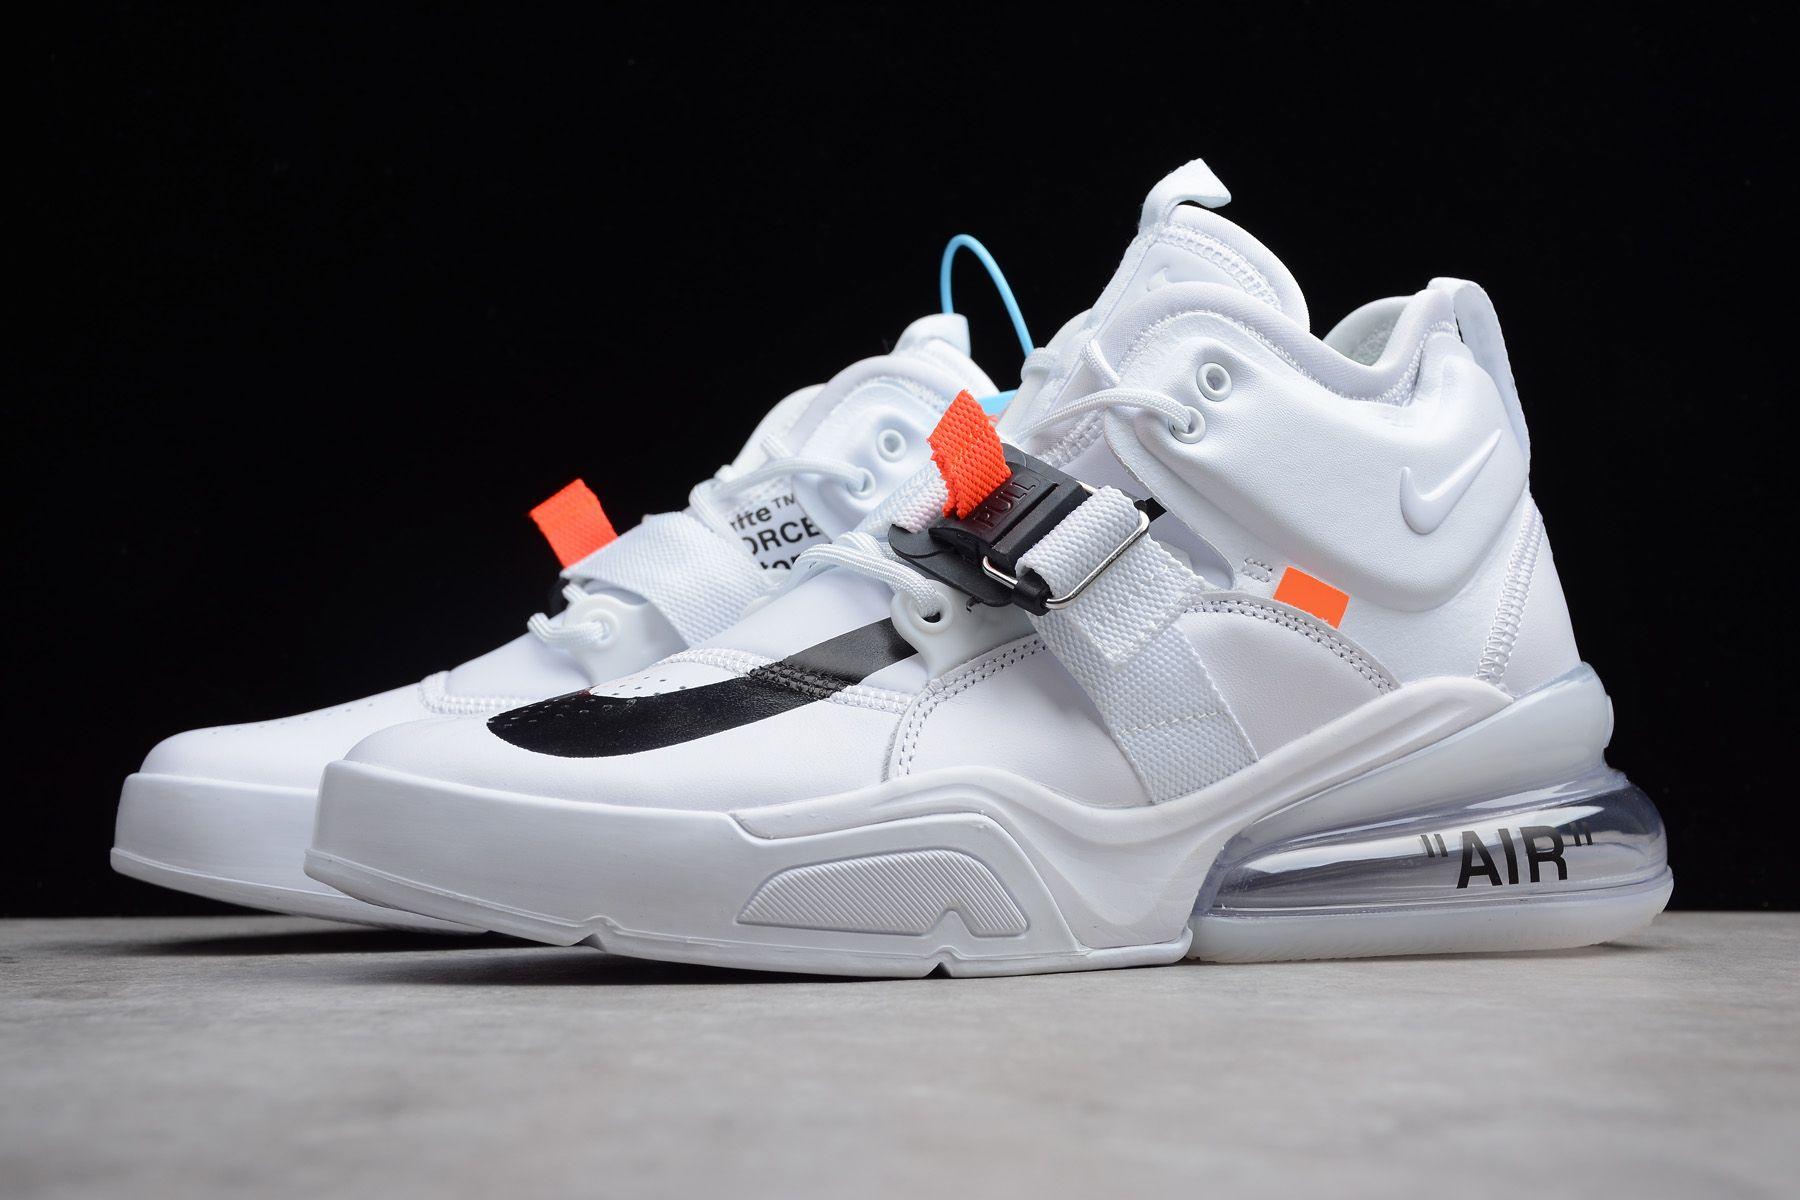 Off White X Nike Air Force 270 White Black Shoes Free Shipping Mens Nike Shoes Sneakers Men Fashion Nike Air